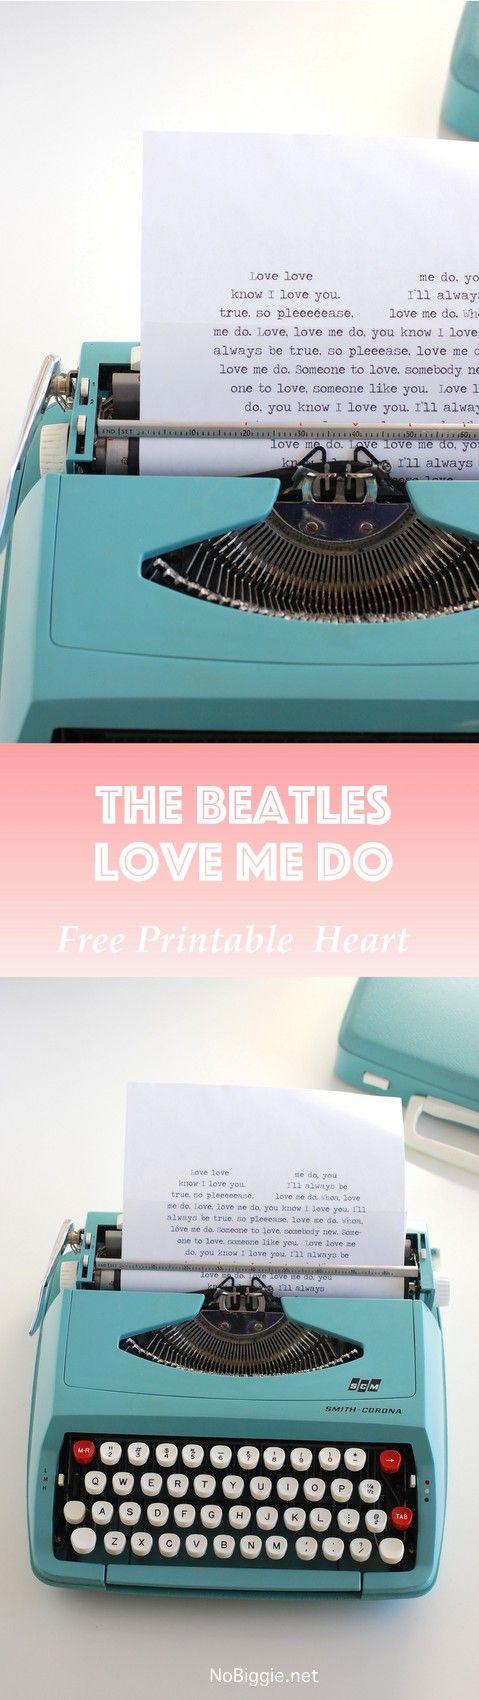 The Beatles - Love Me Do in a printable heart | NoBiggie.net